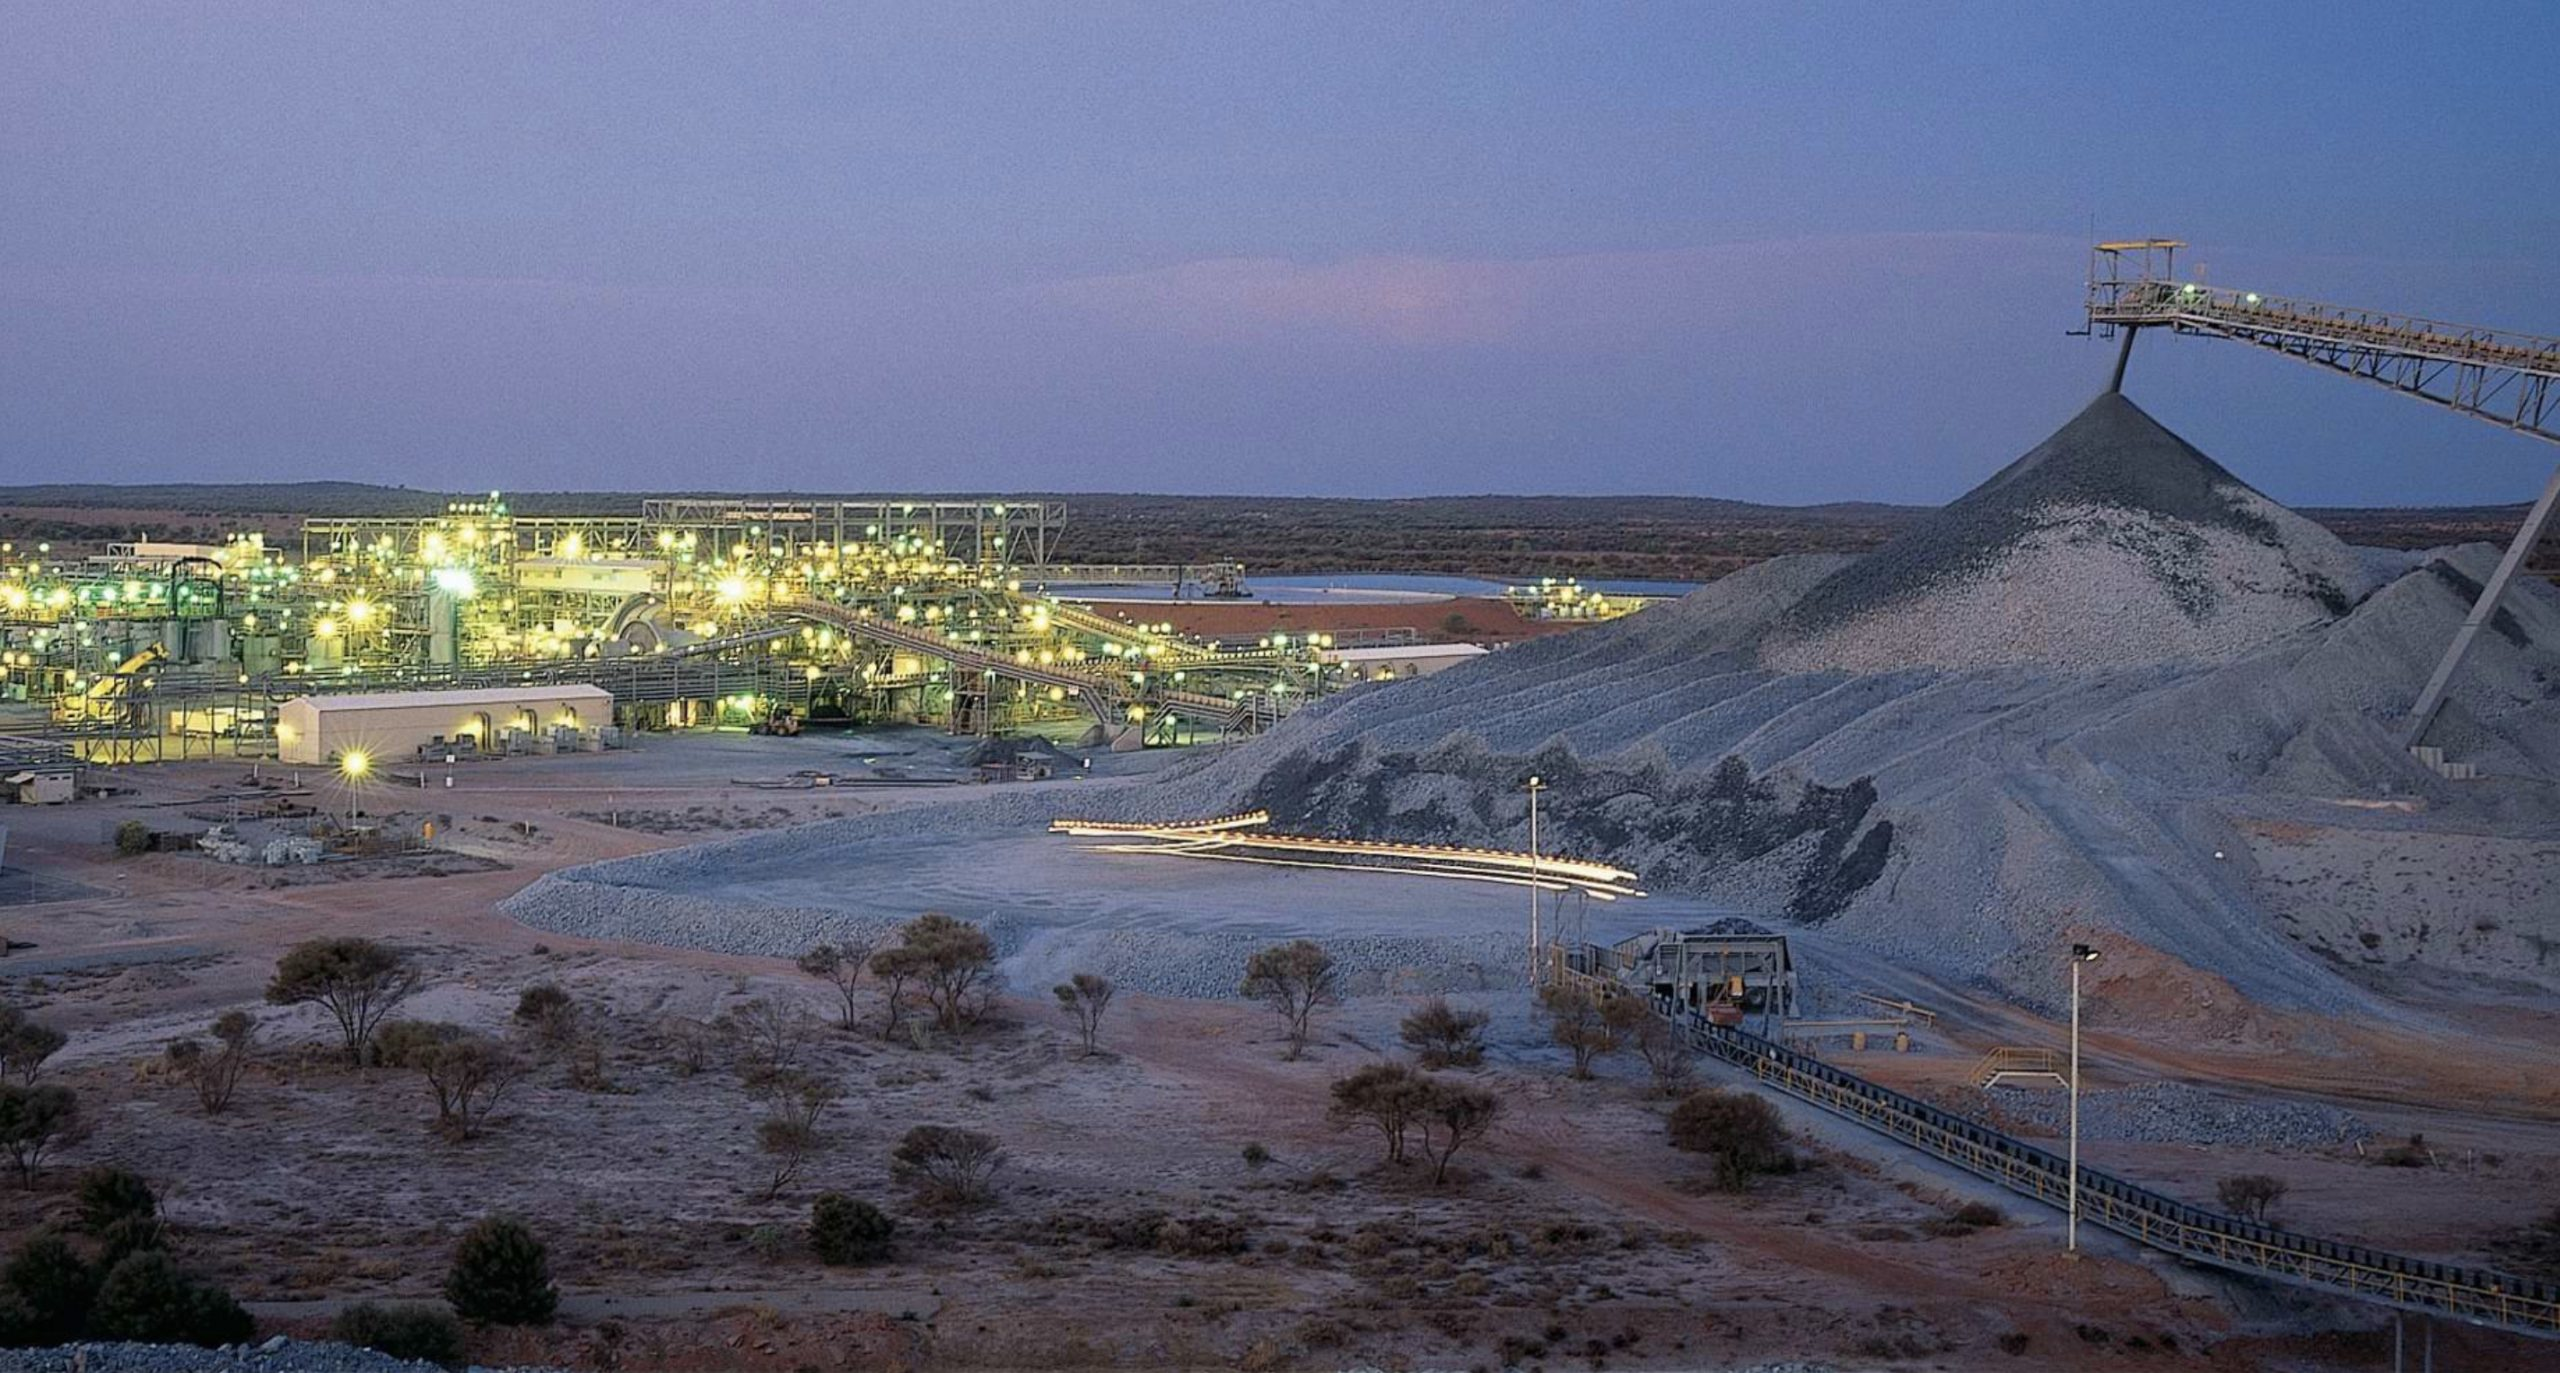 tesla-gets-nickel-supply-from-australia-miner